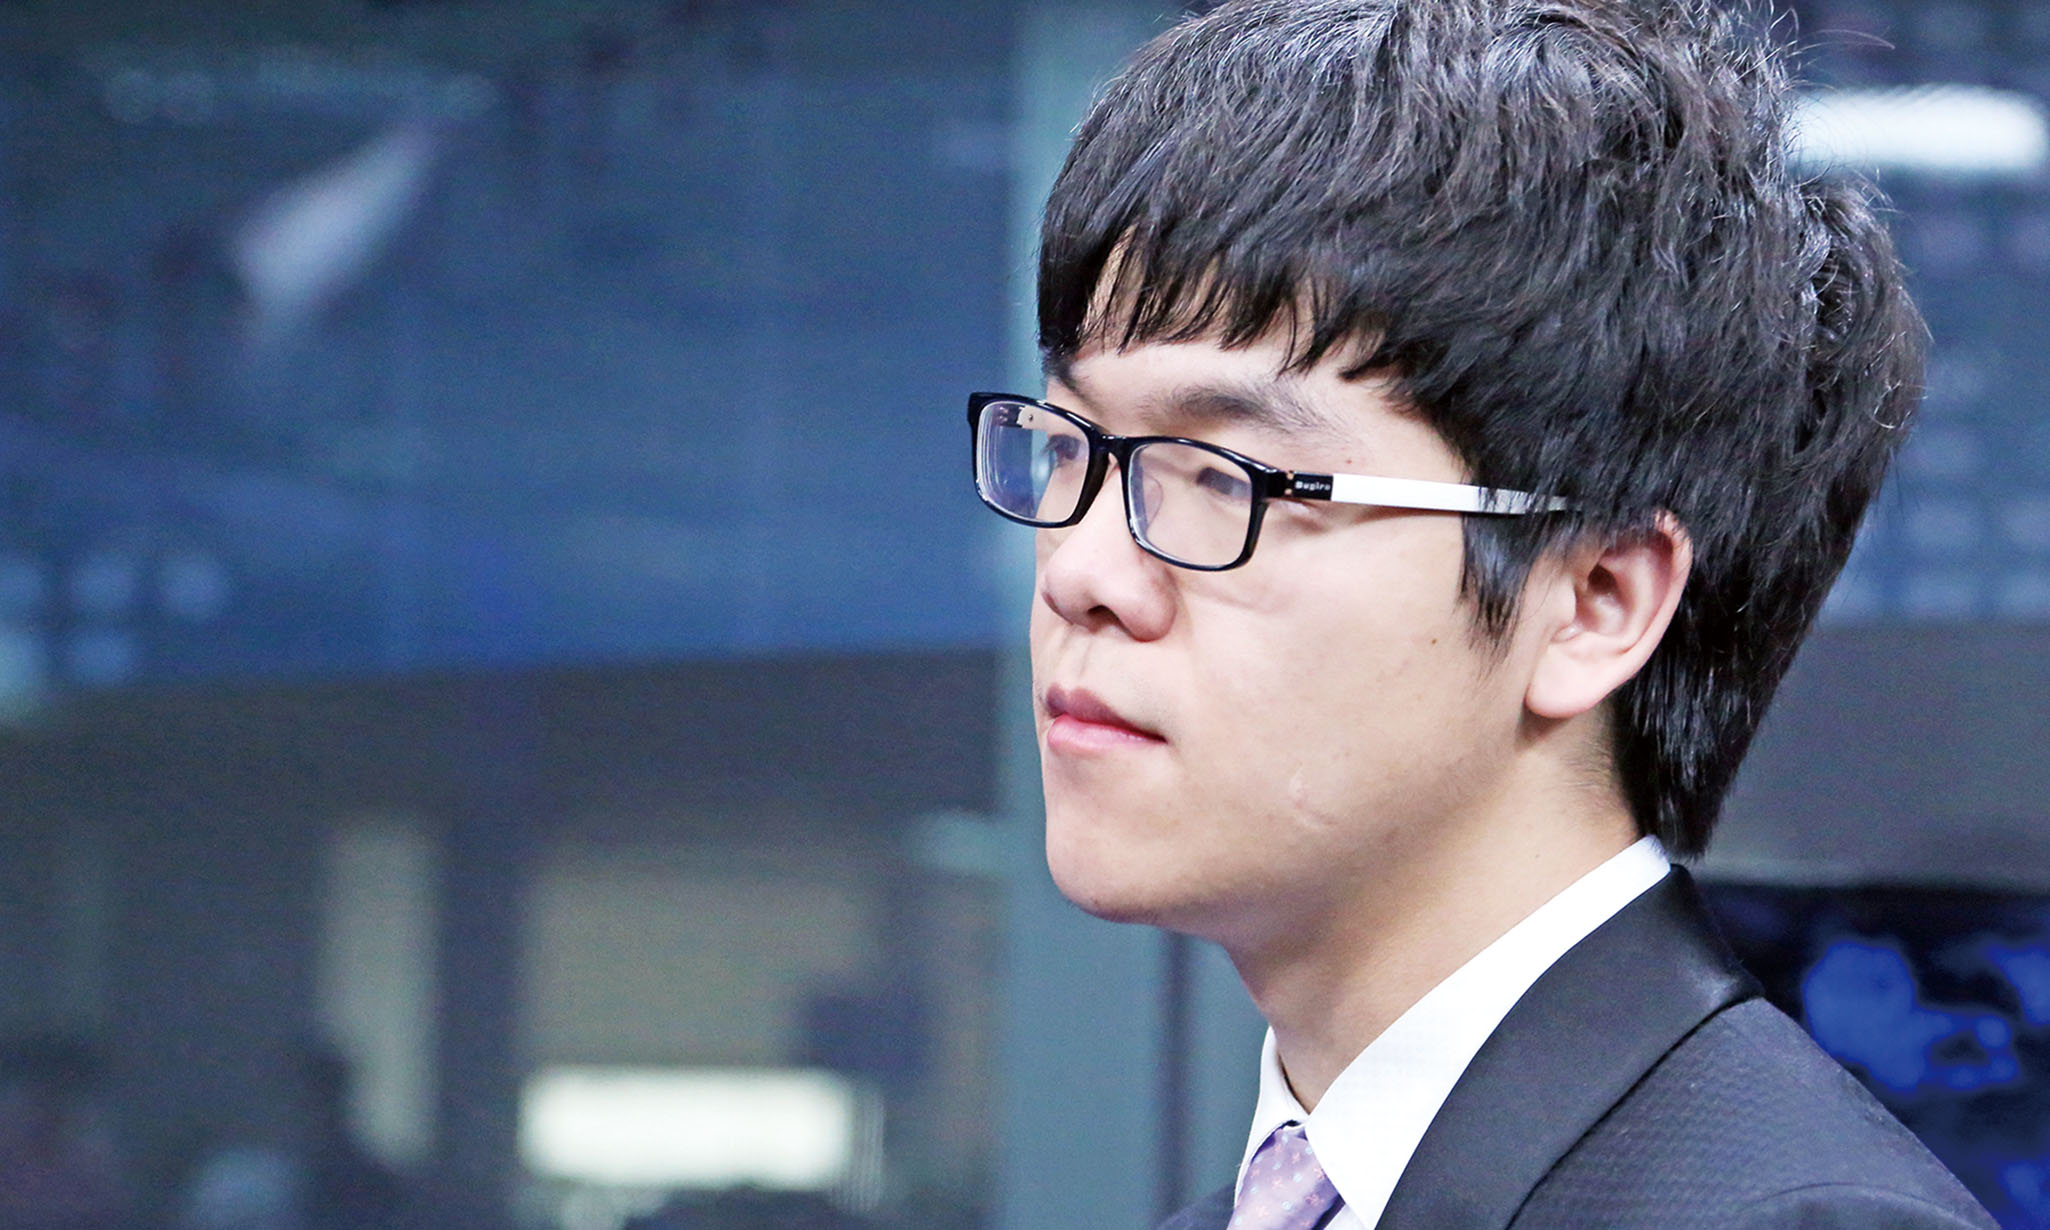 柯潔將對決AlphaGo